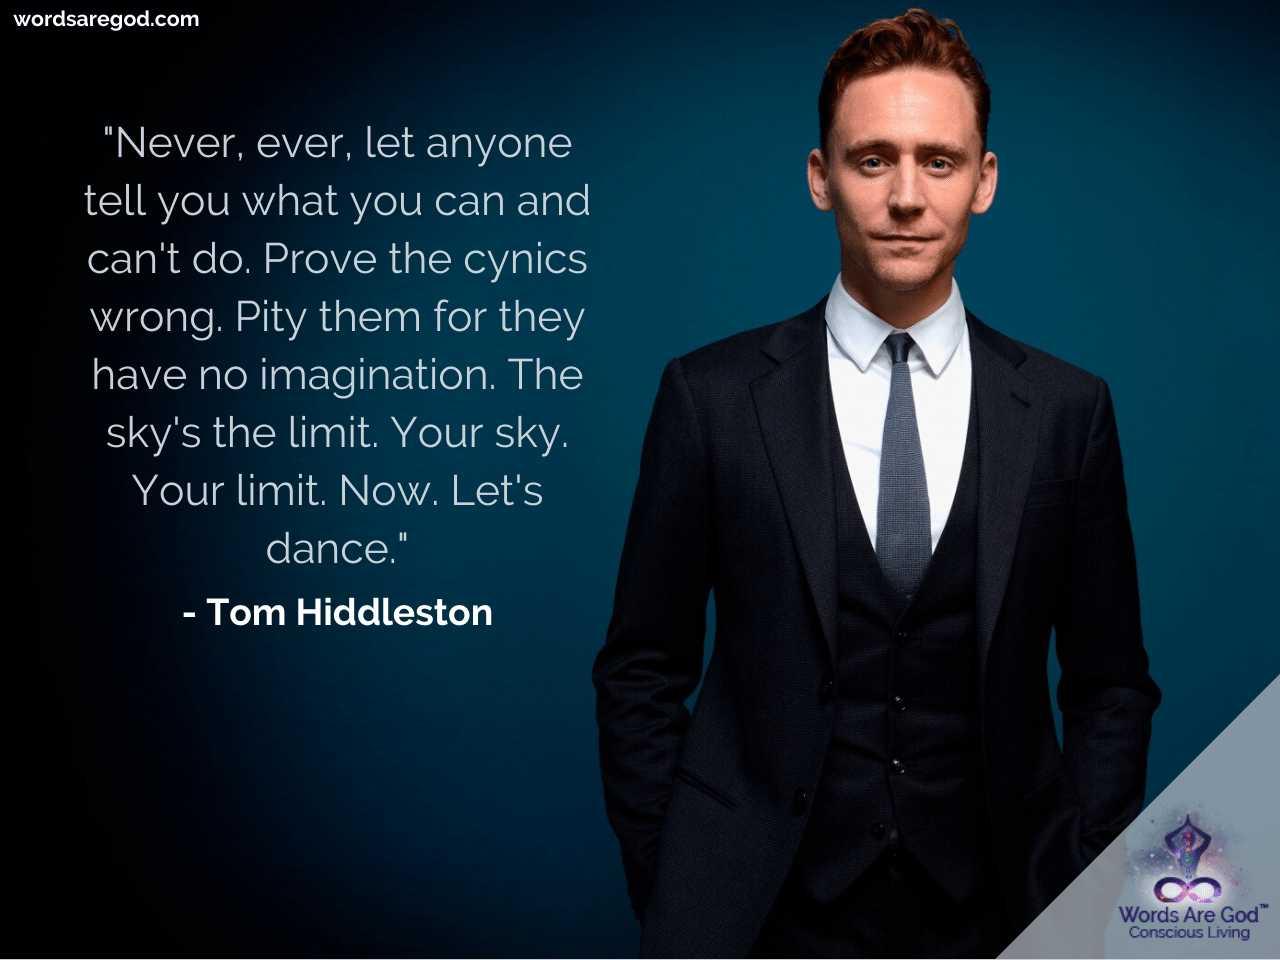 Tom Hiddleston Inspirational Quotes by Tom Hiddleston